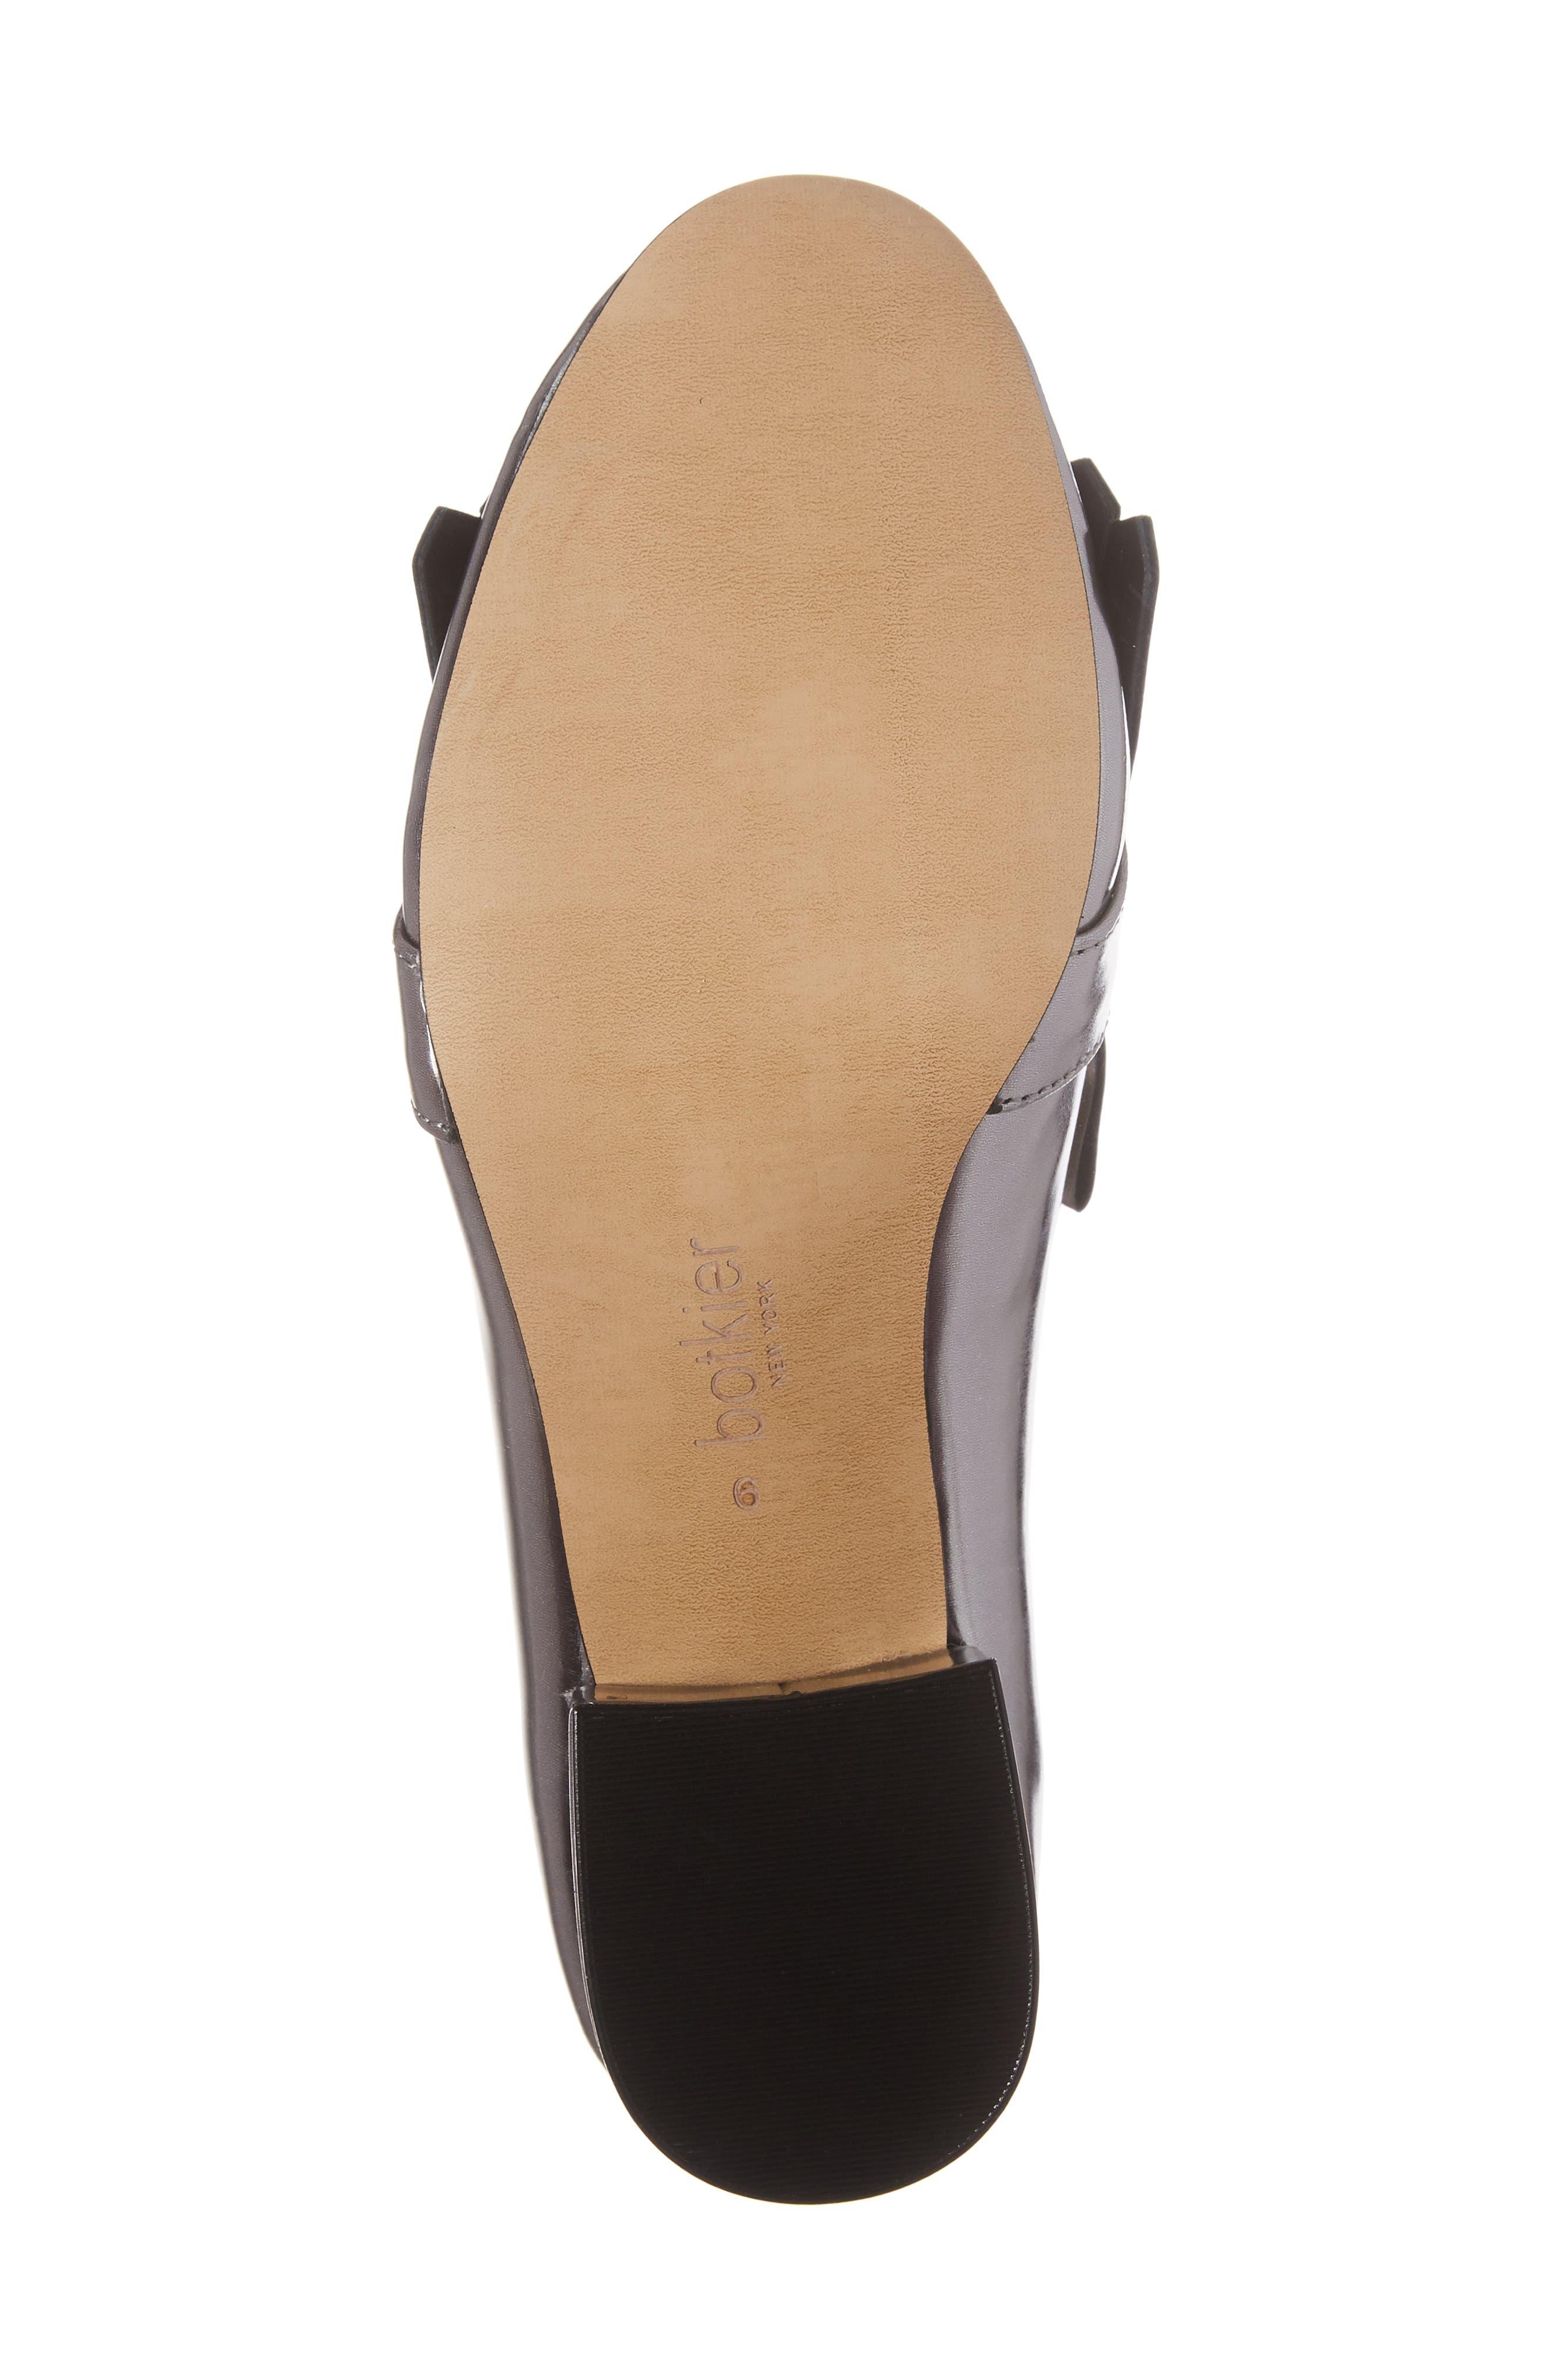 Olive Loafer Pump,                             Alternate thumbnail 6, color,                             Pewter Leather